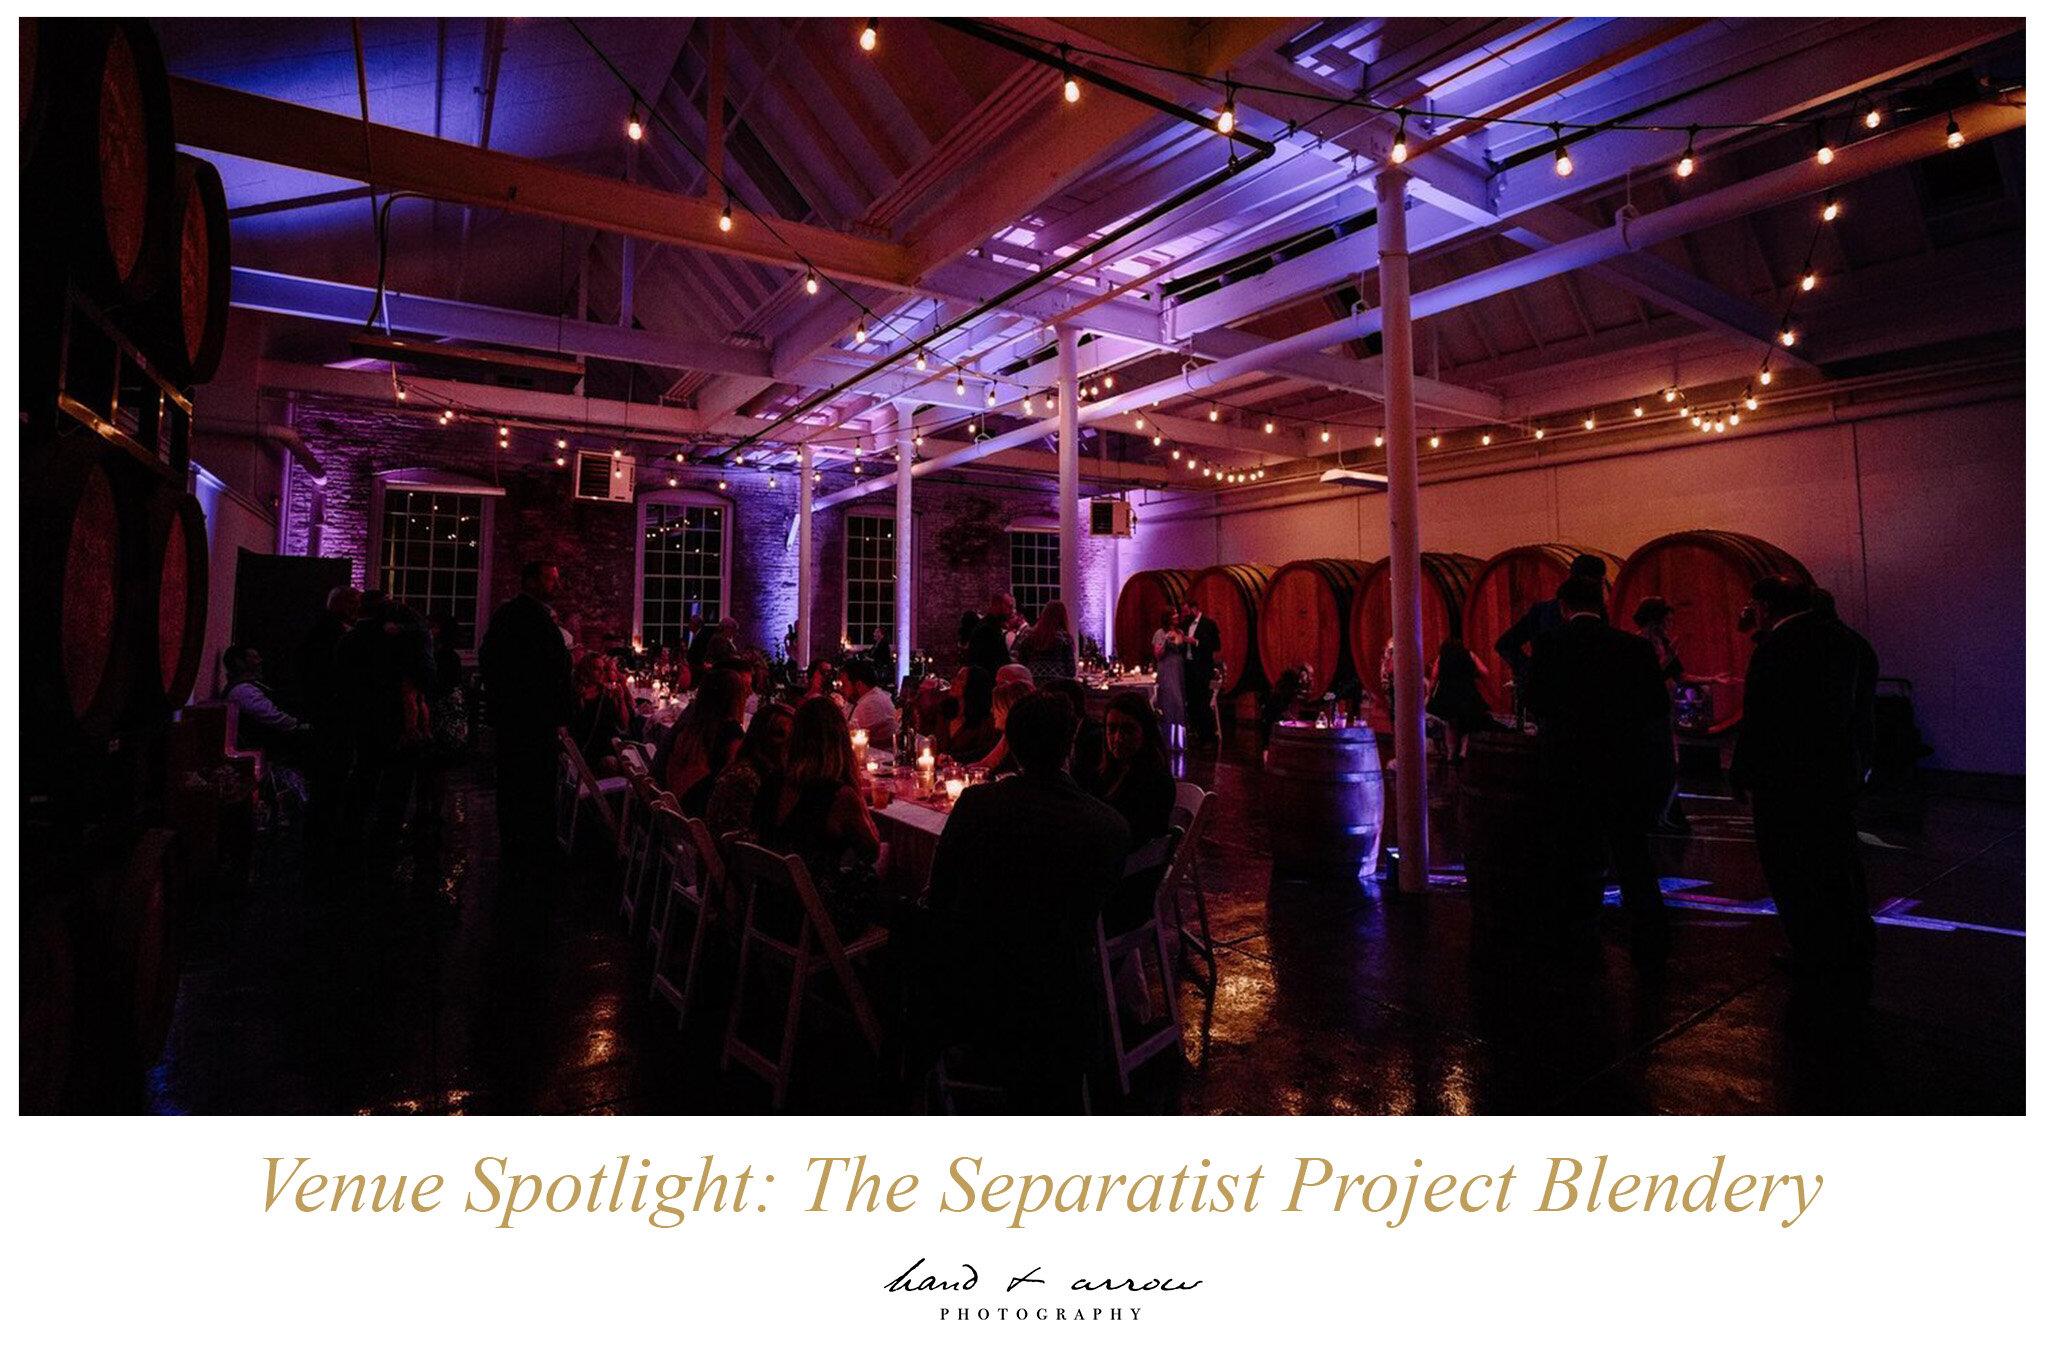 Venue Spotlight The Separatist Project Blendery In Easton Pa